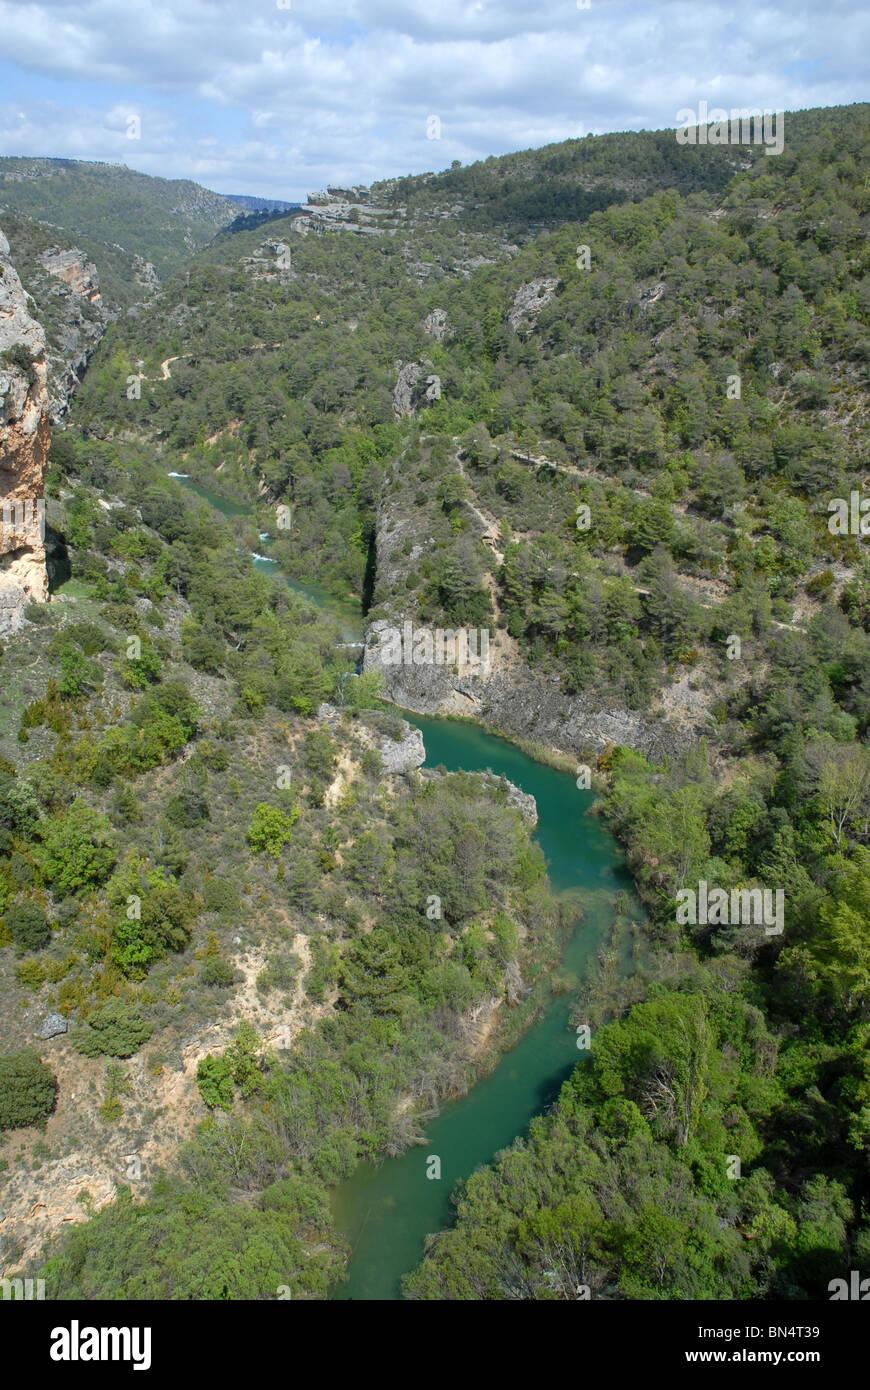 Jucar River, Serrania de Cuenca, Castile-La Mancha, Spain - Stock Image